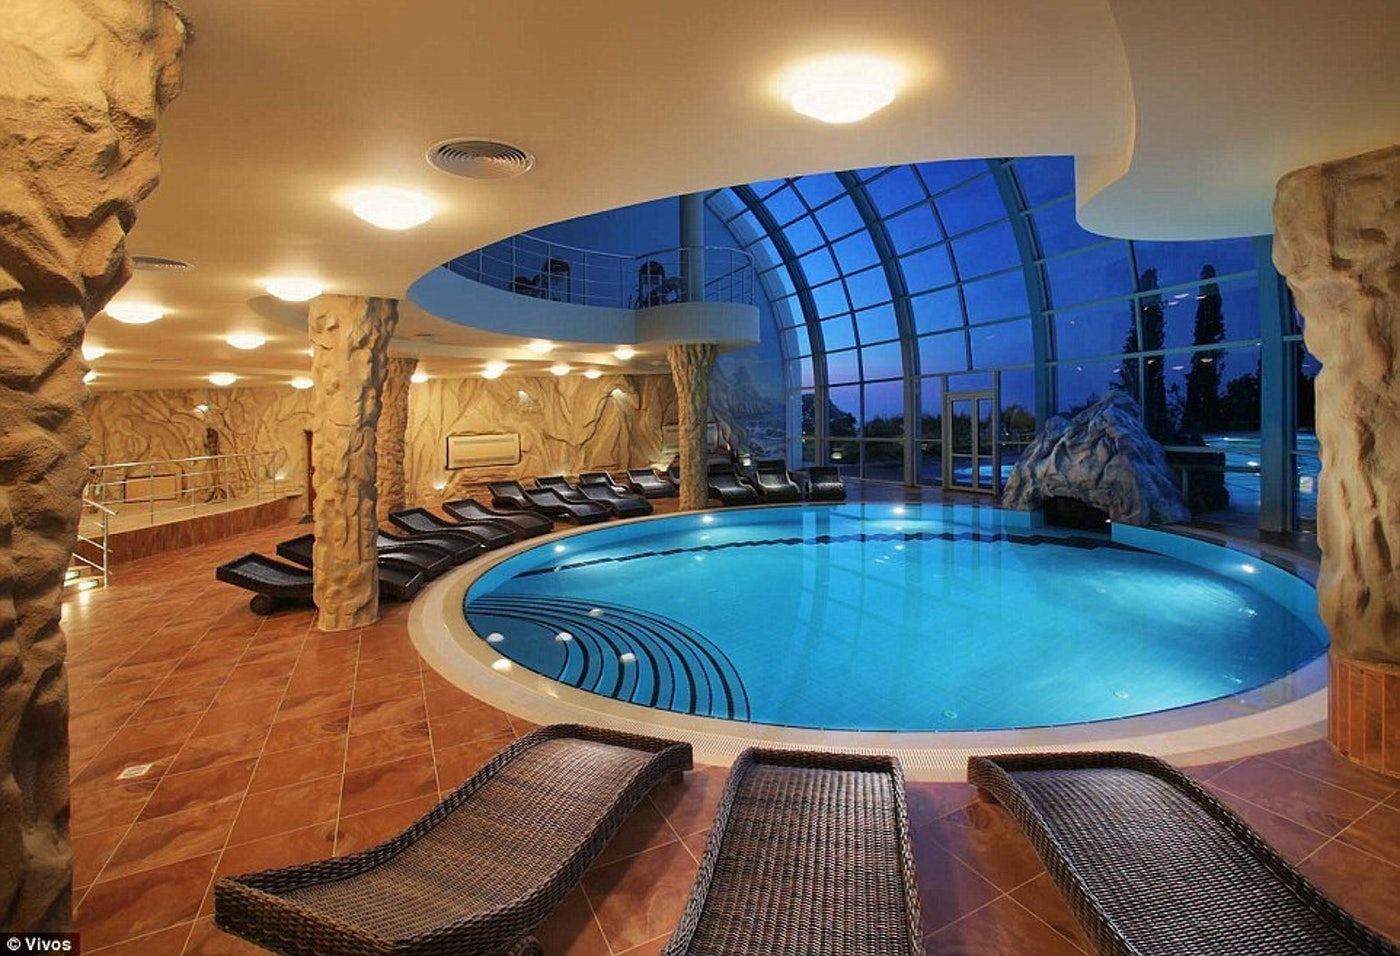 A community pool inside the Vivos Europa One shelter. | Technologie ...